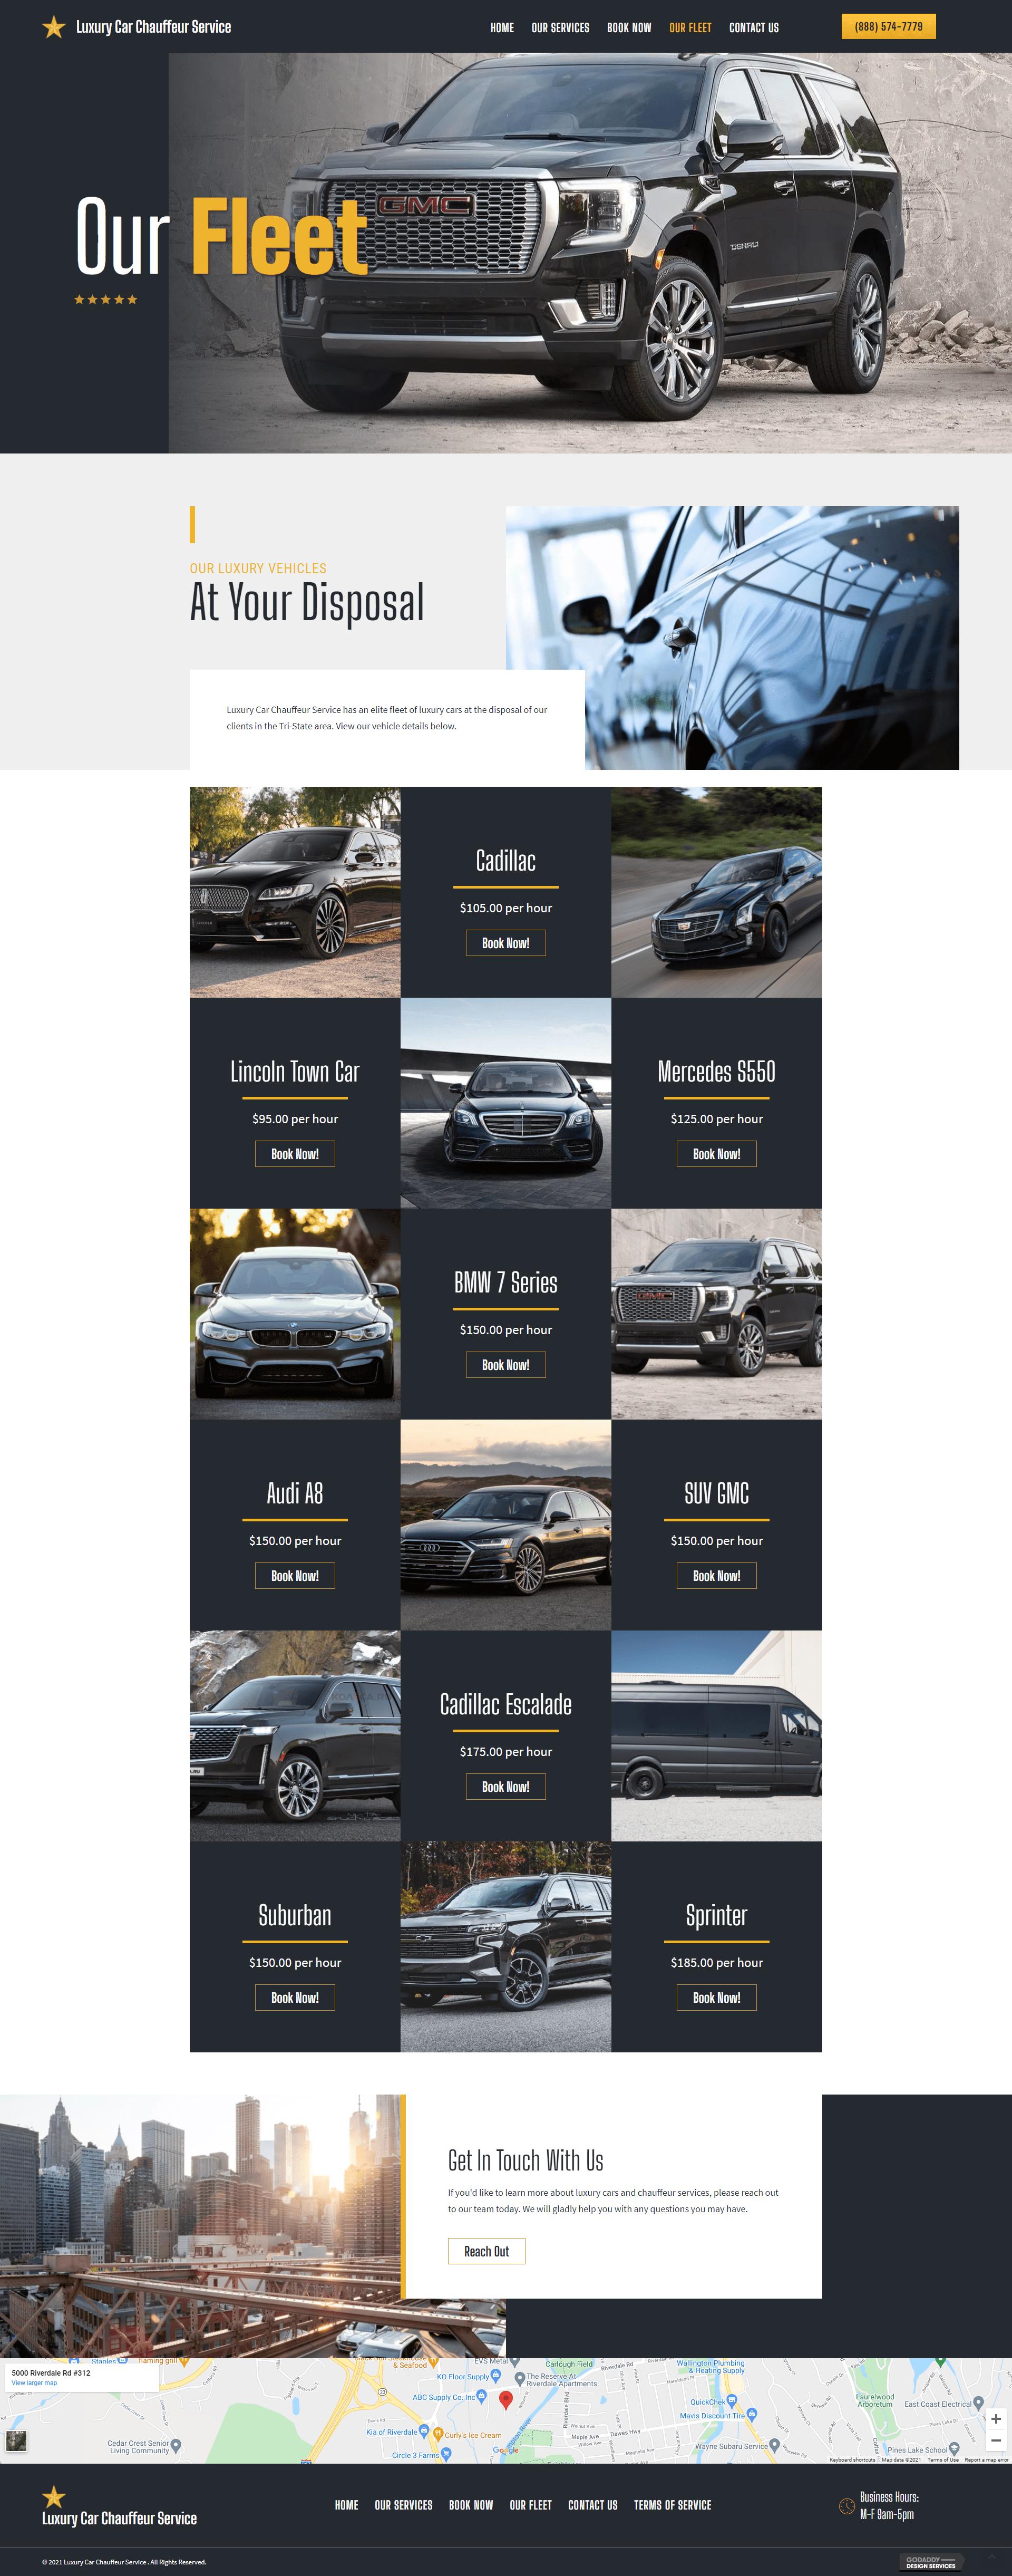 Luxury Car Chauffeur Service Fleet